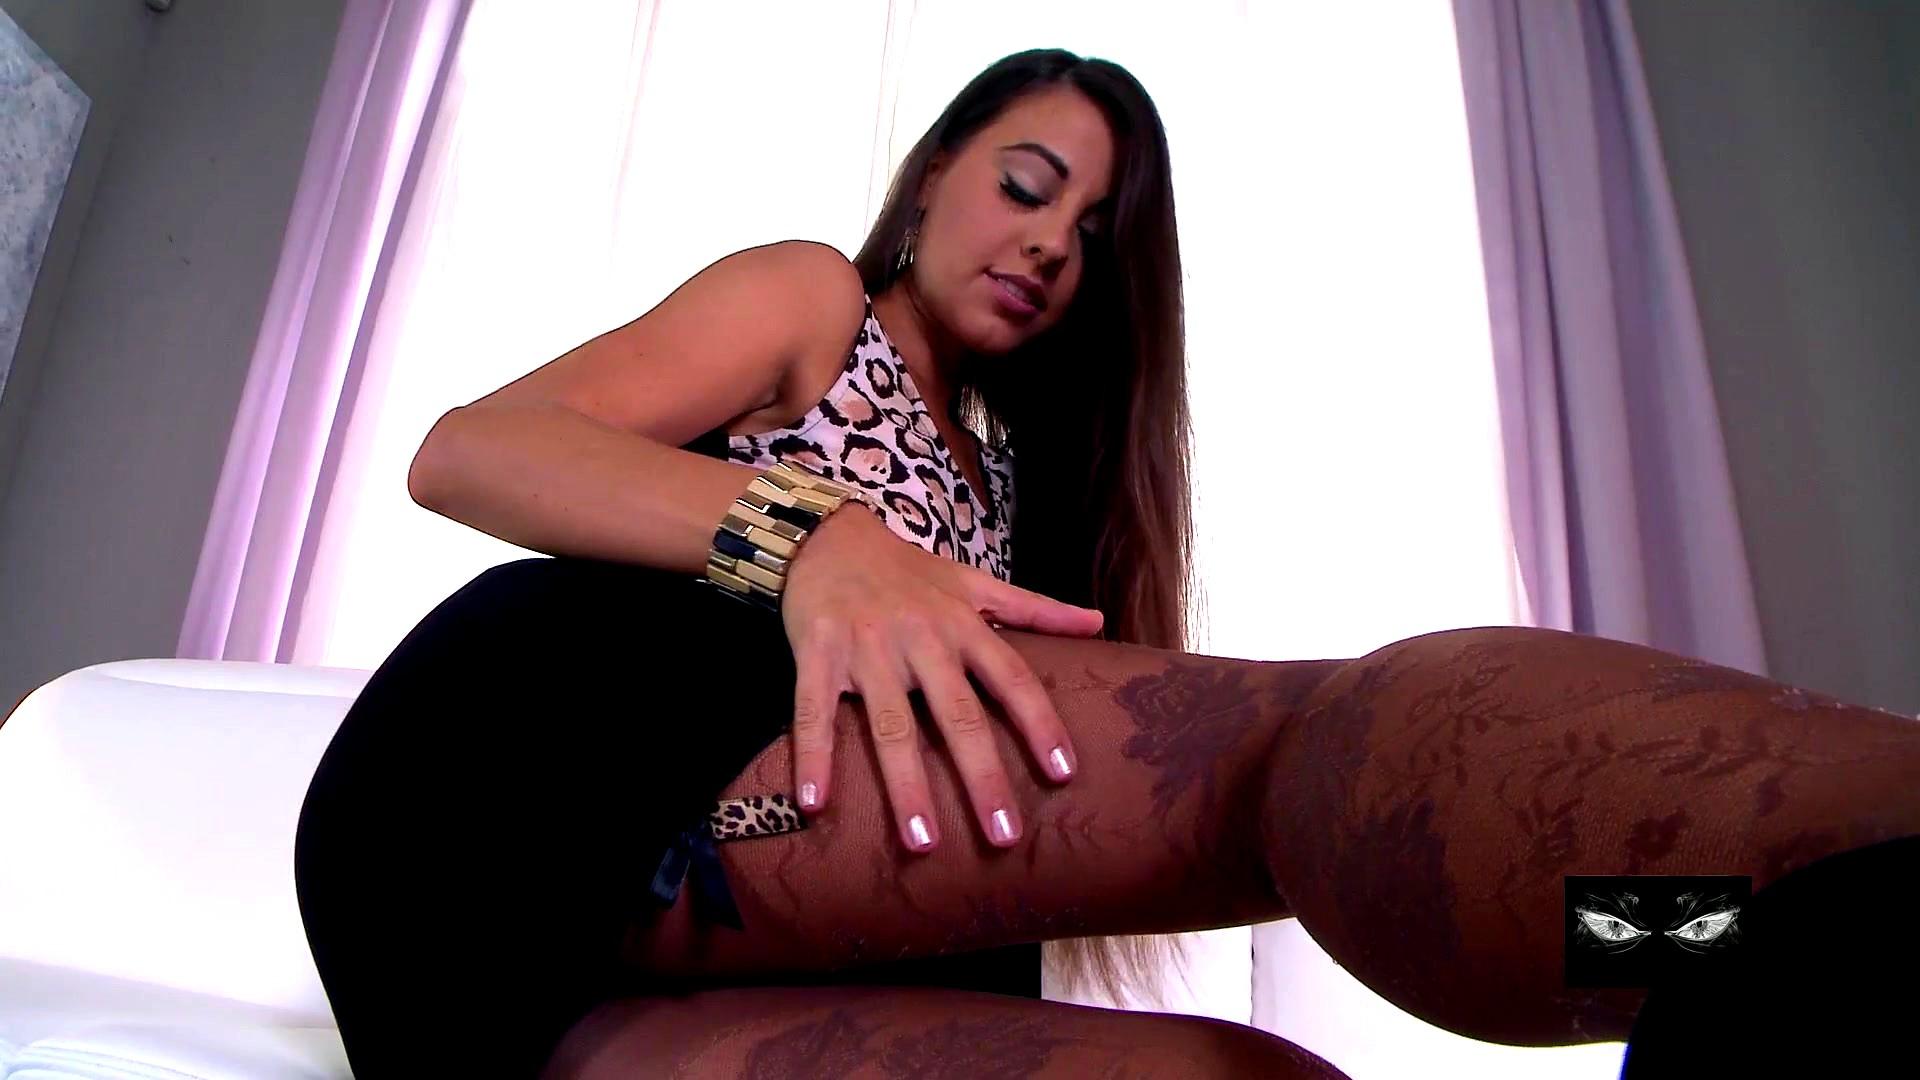 Ana Garcia Porno gabi garcia porn - megapornx